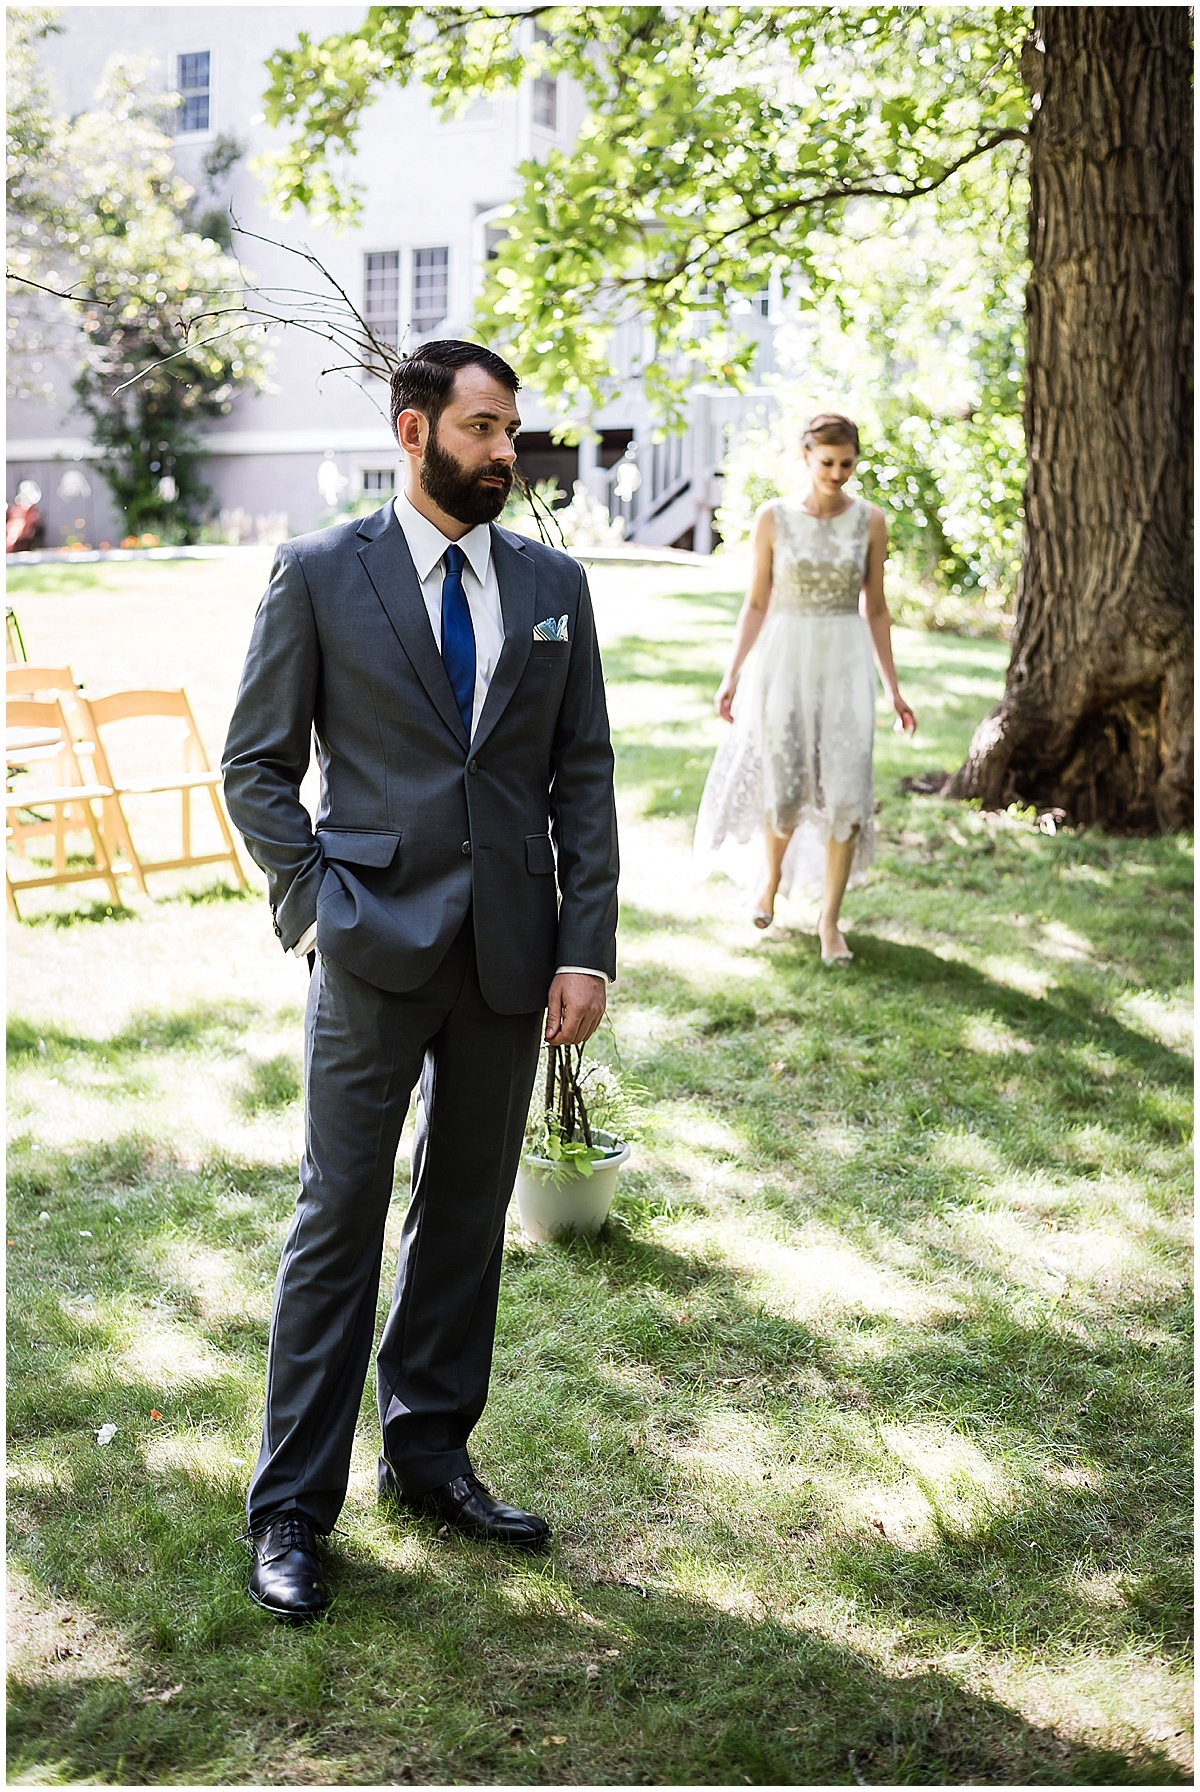 K Solberg Photography Stillwater Backyard Wedding_0012.jpg